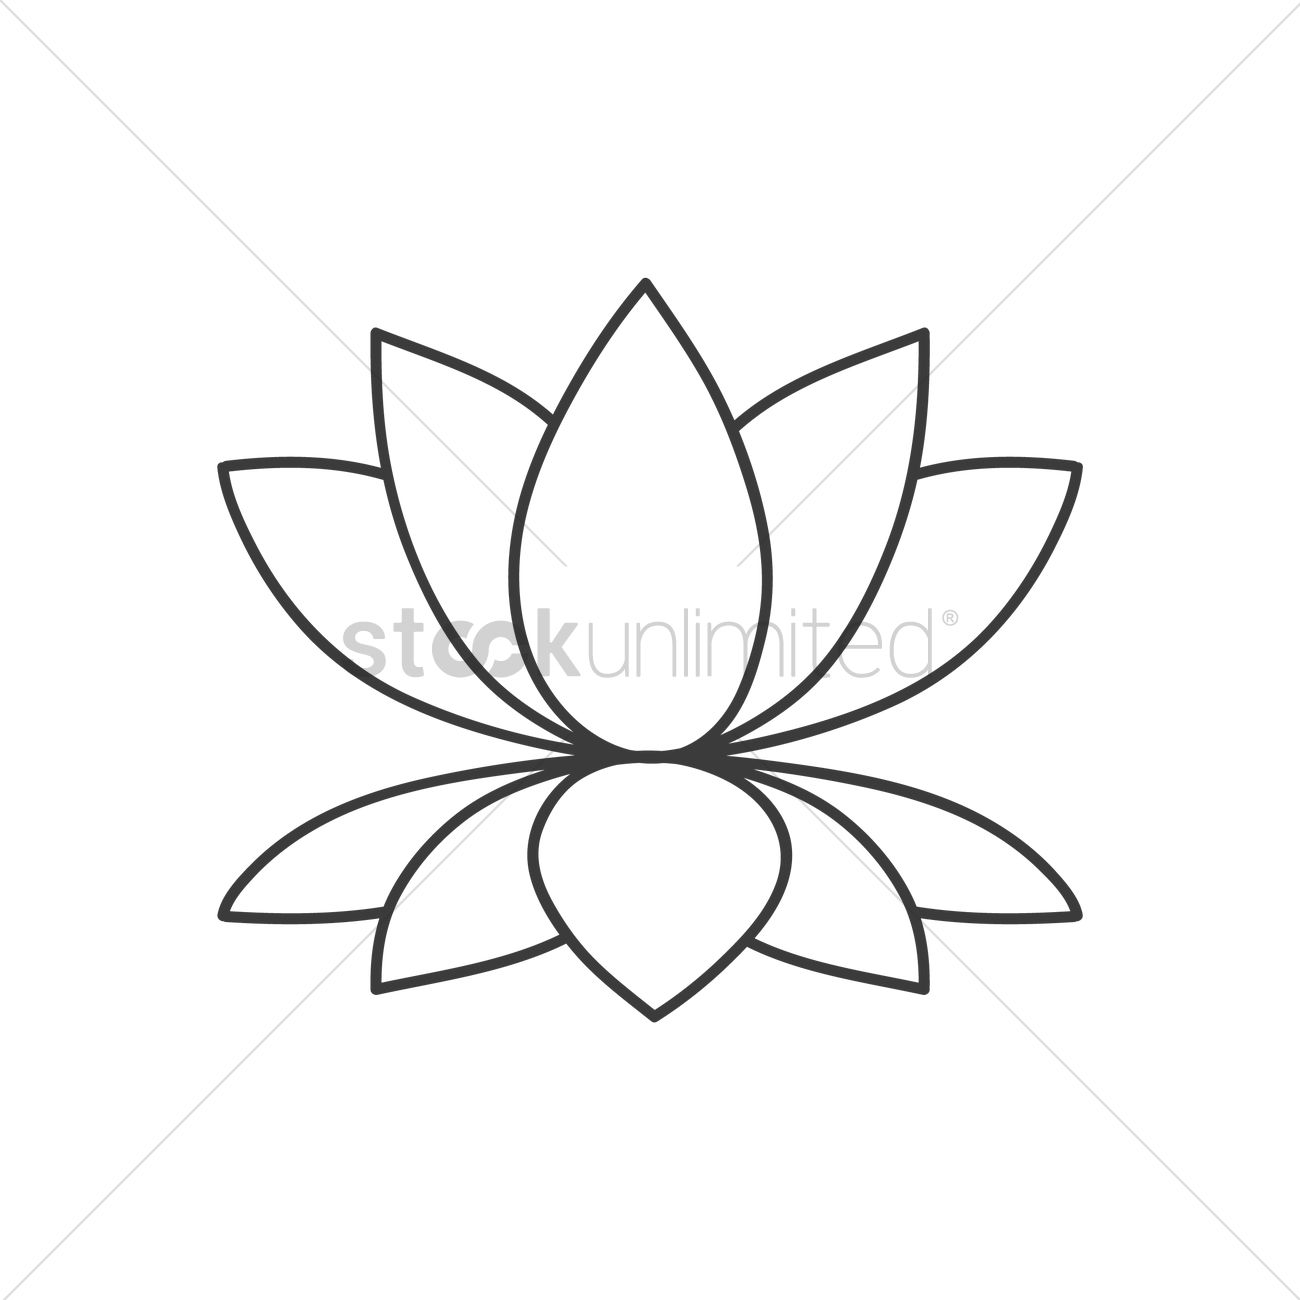 Lotus flower vector graphic flowers healthy lotus flower vector graphic lotus flower vector image 1970754 stockunlimited izmirmasajfo